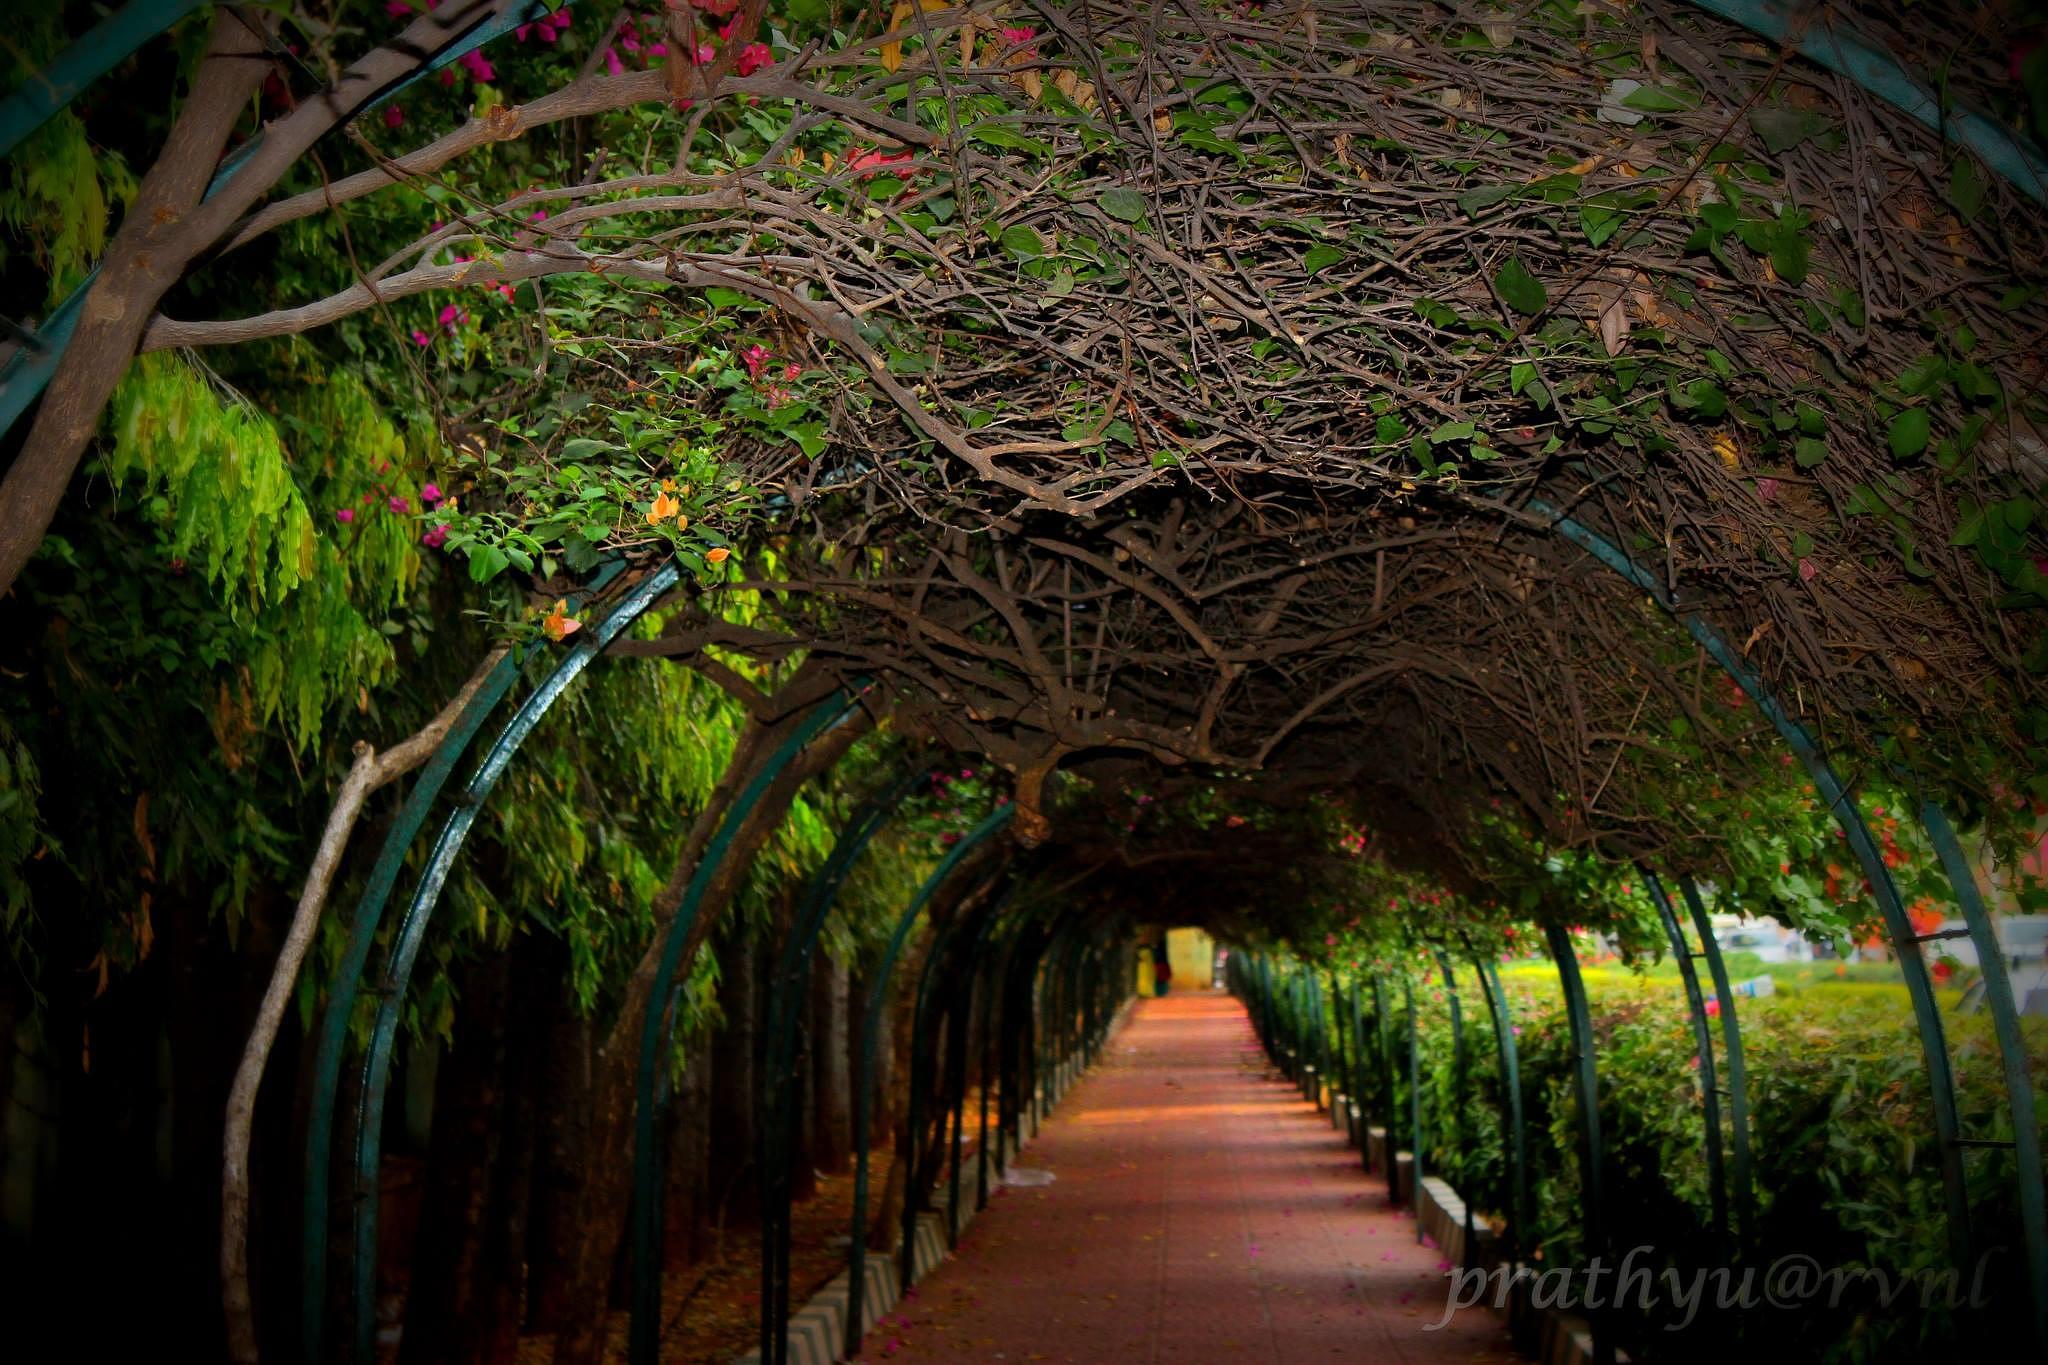 Garden by rvnlprathyusha